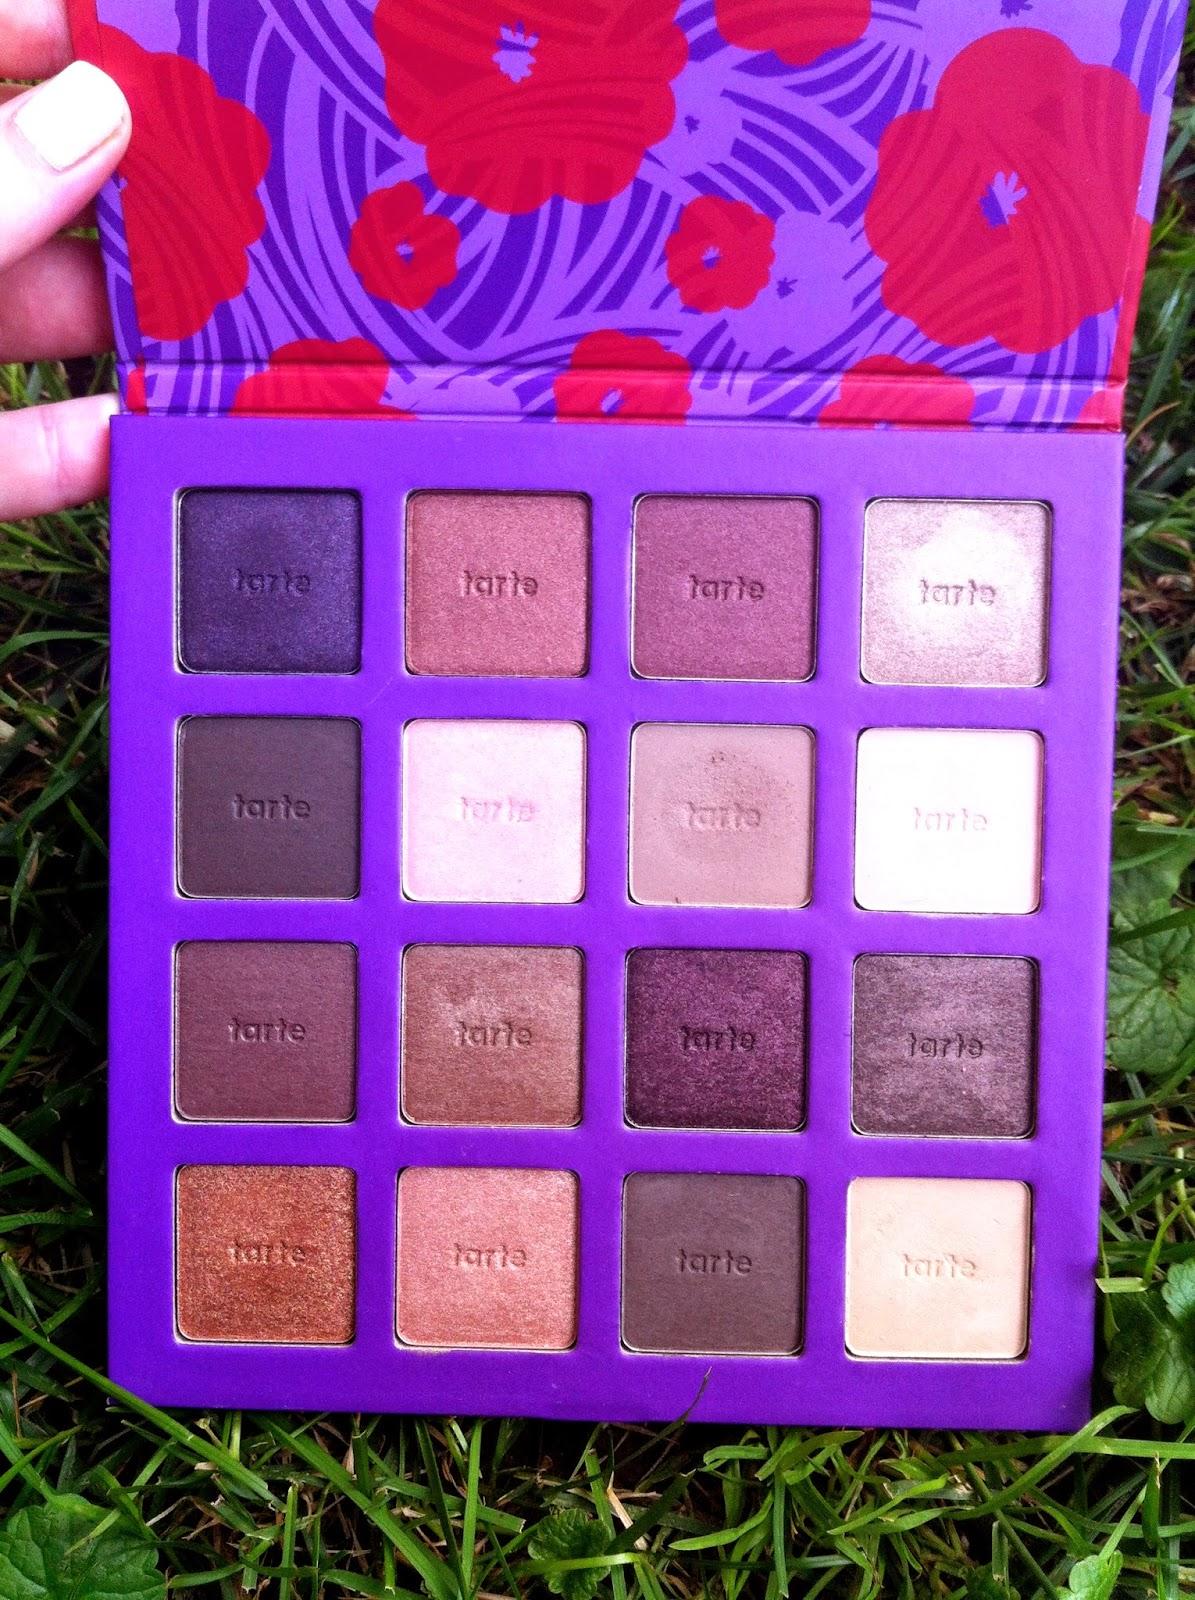 Tarte Limited Edition Palette